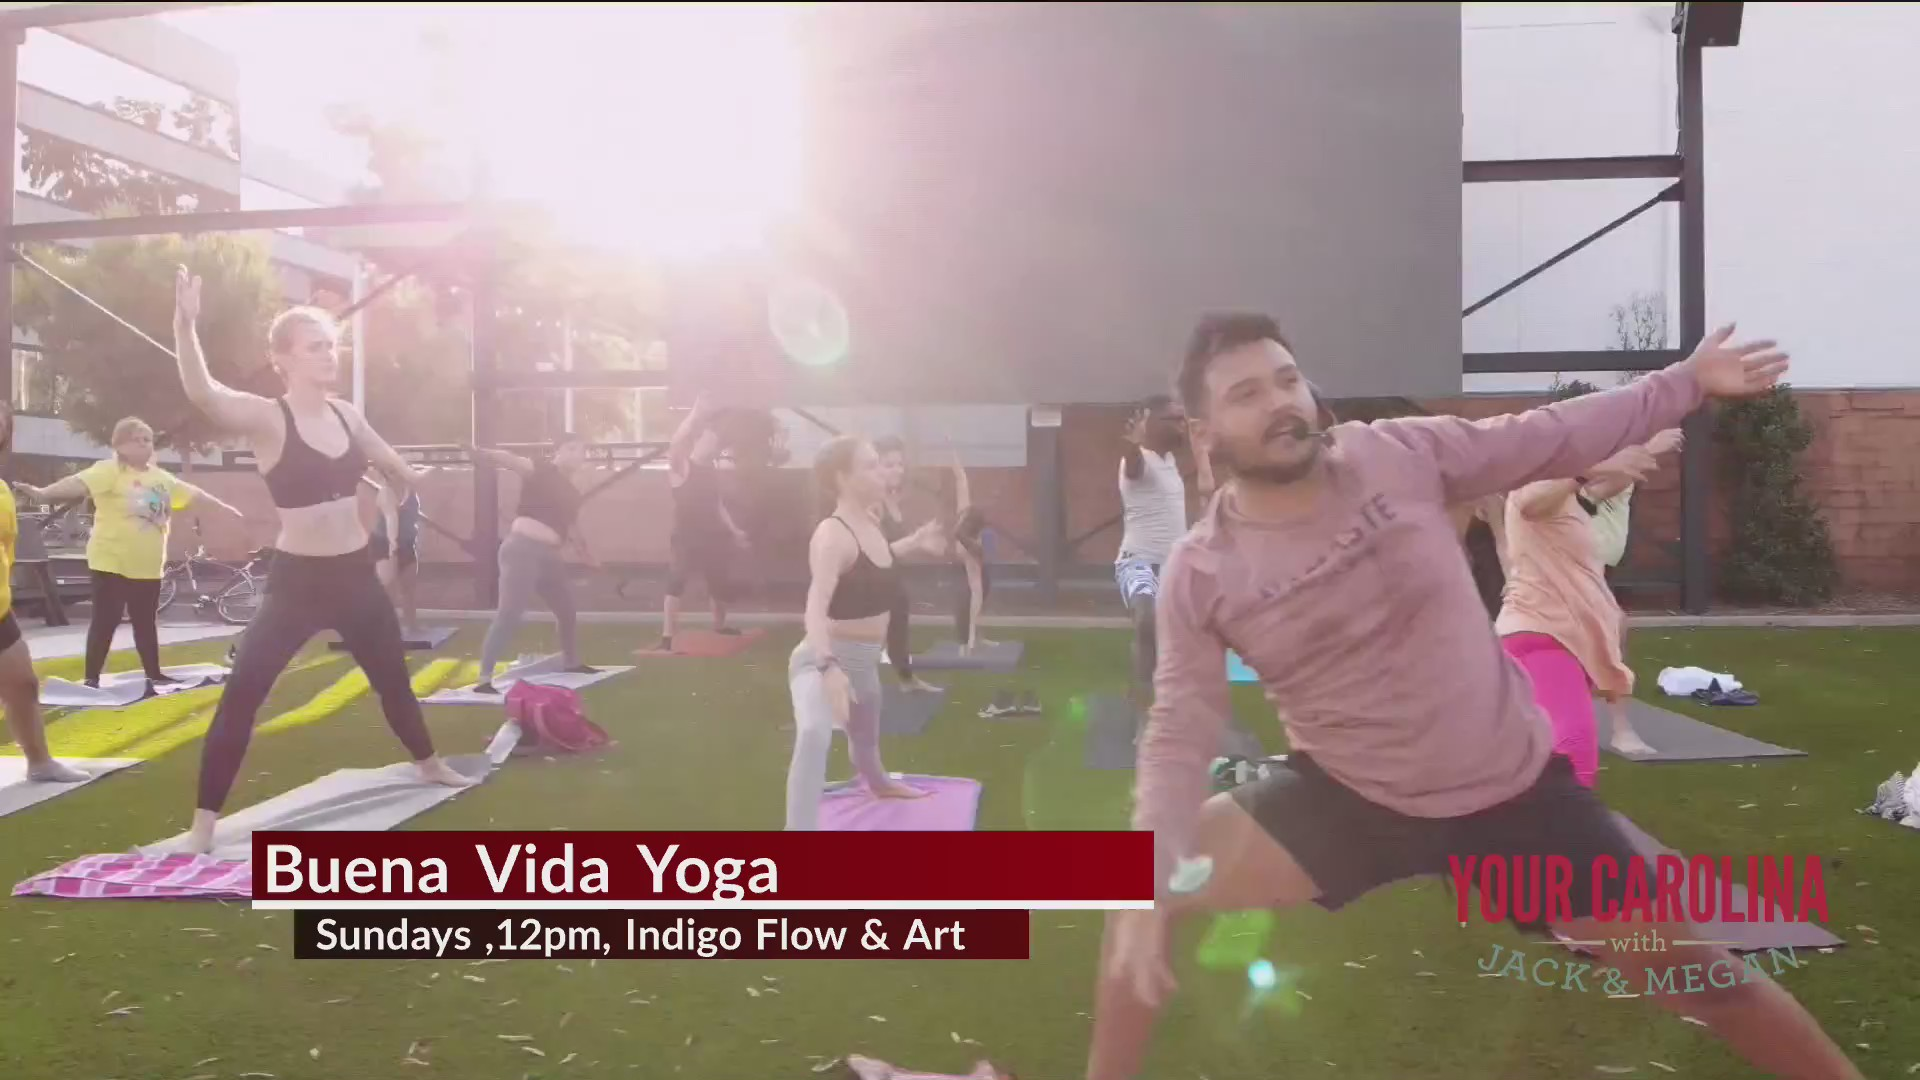 Buena Vida Yoga